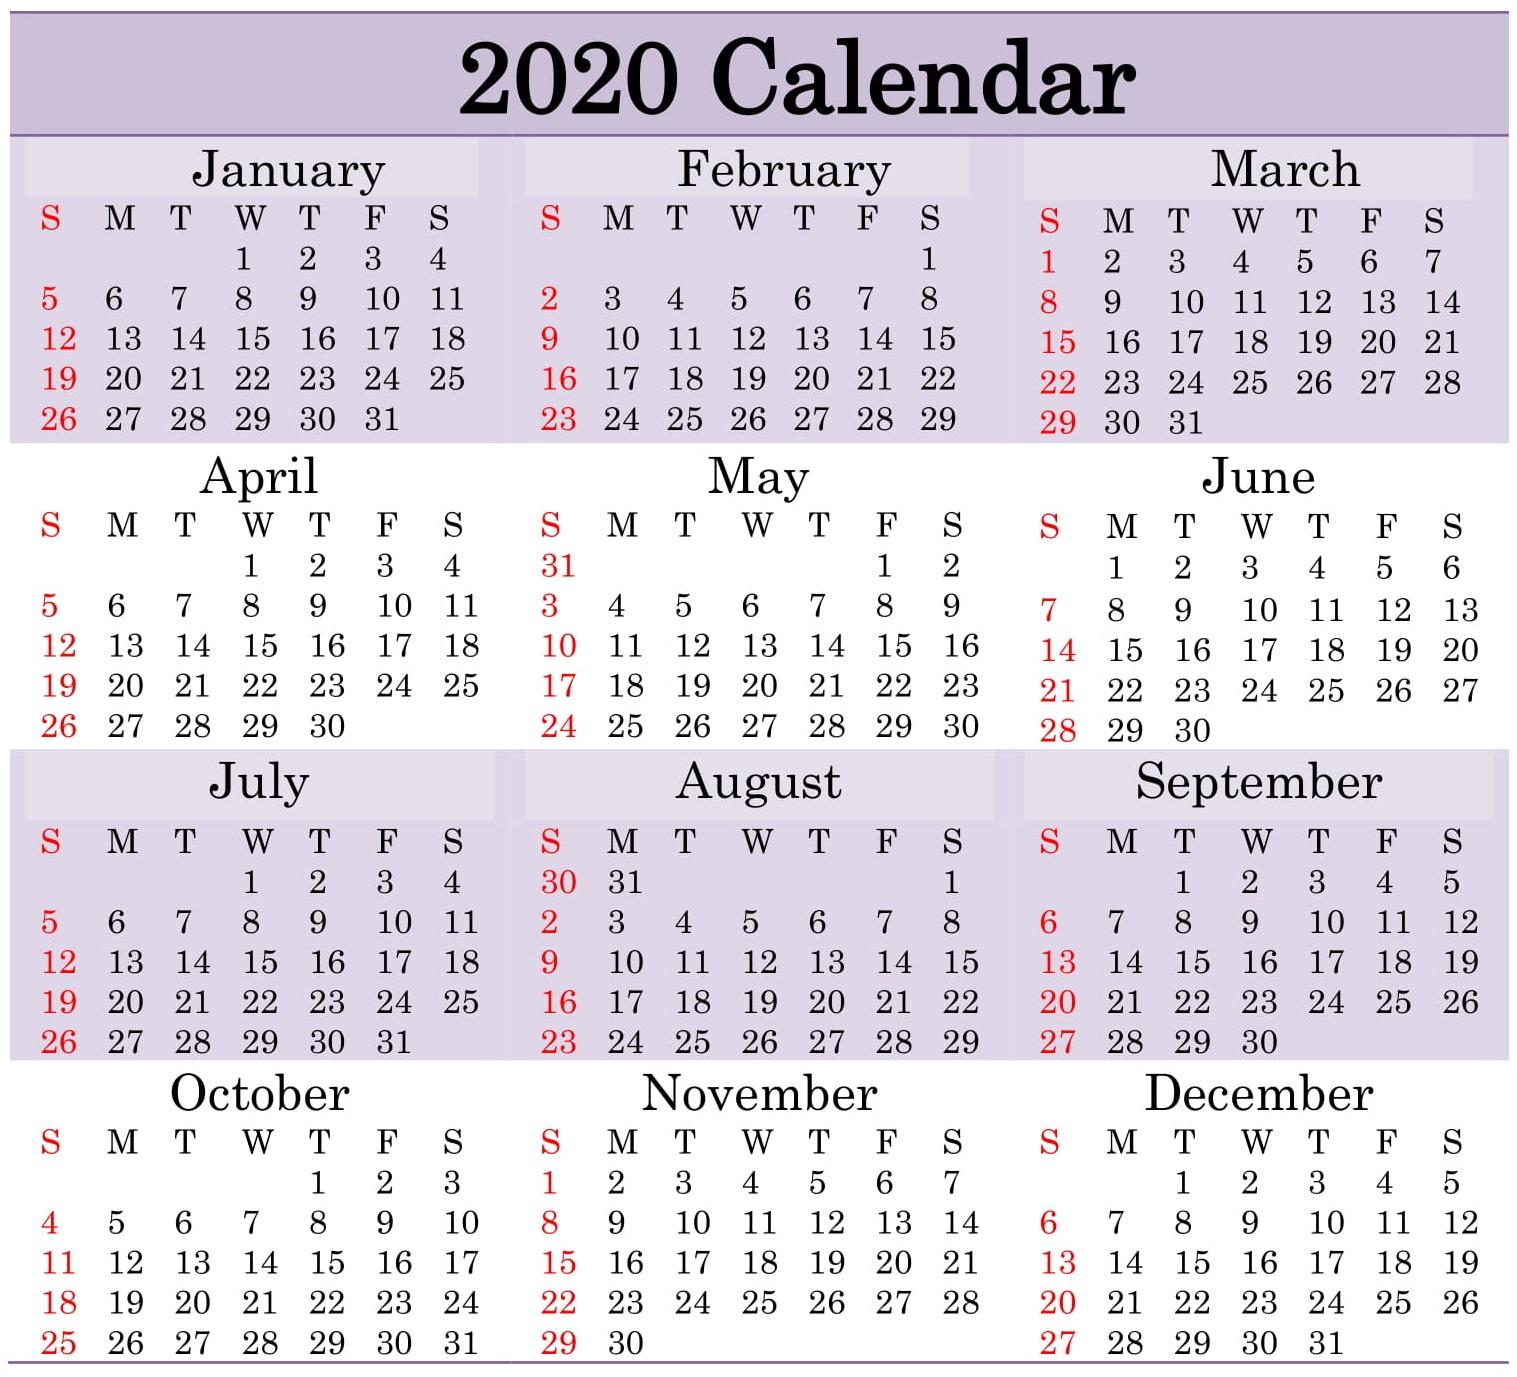 Julian Date Converter 2021   Printable Calendar 20202021 for Conver Dec 8 2021 To Julian Date